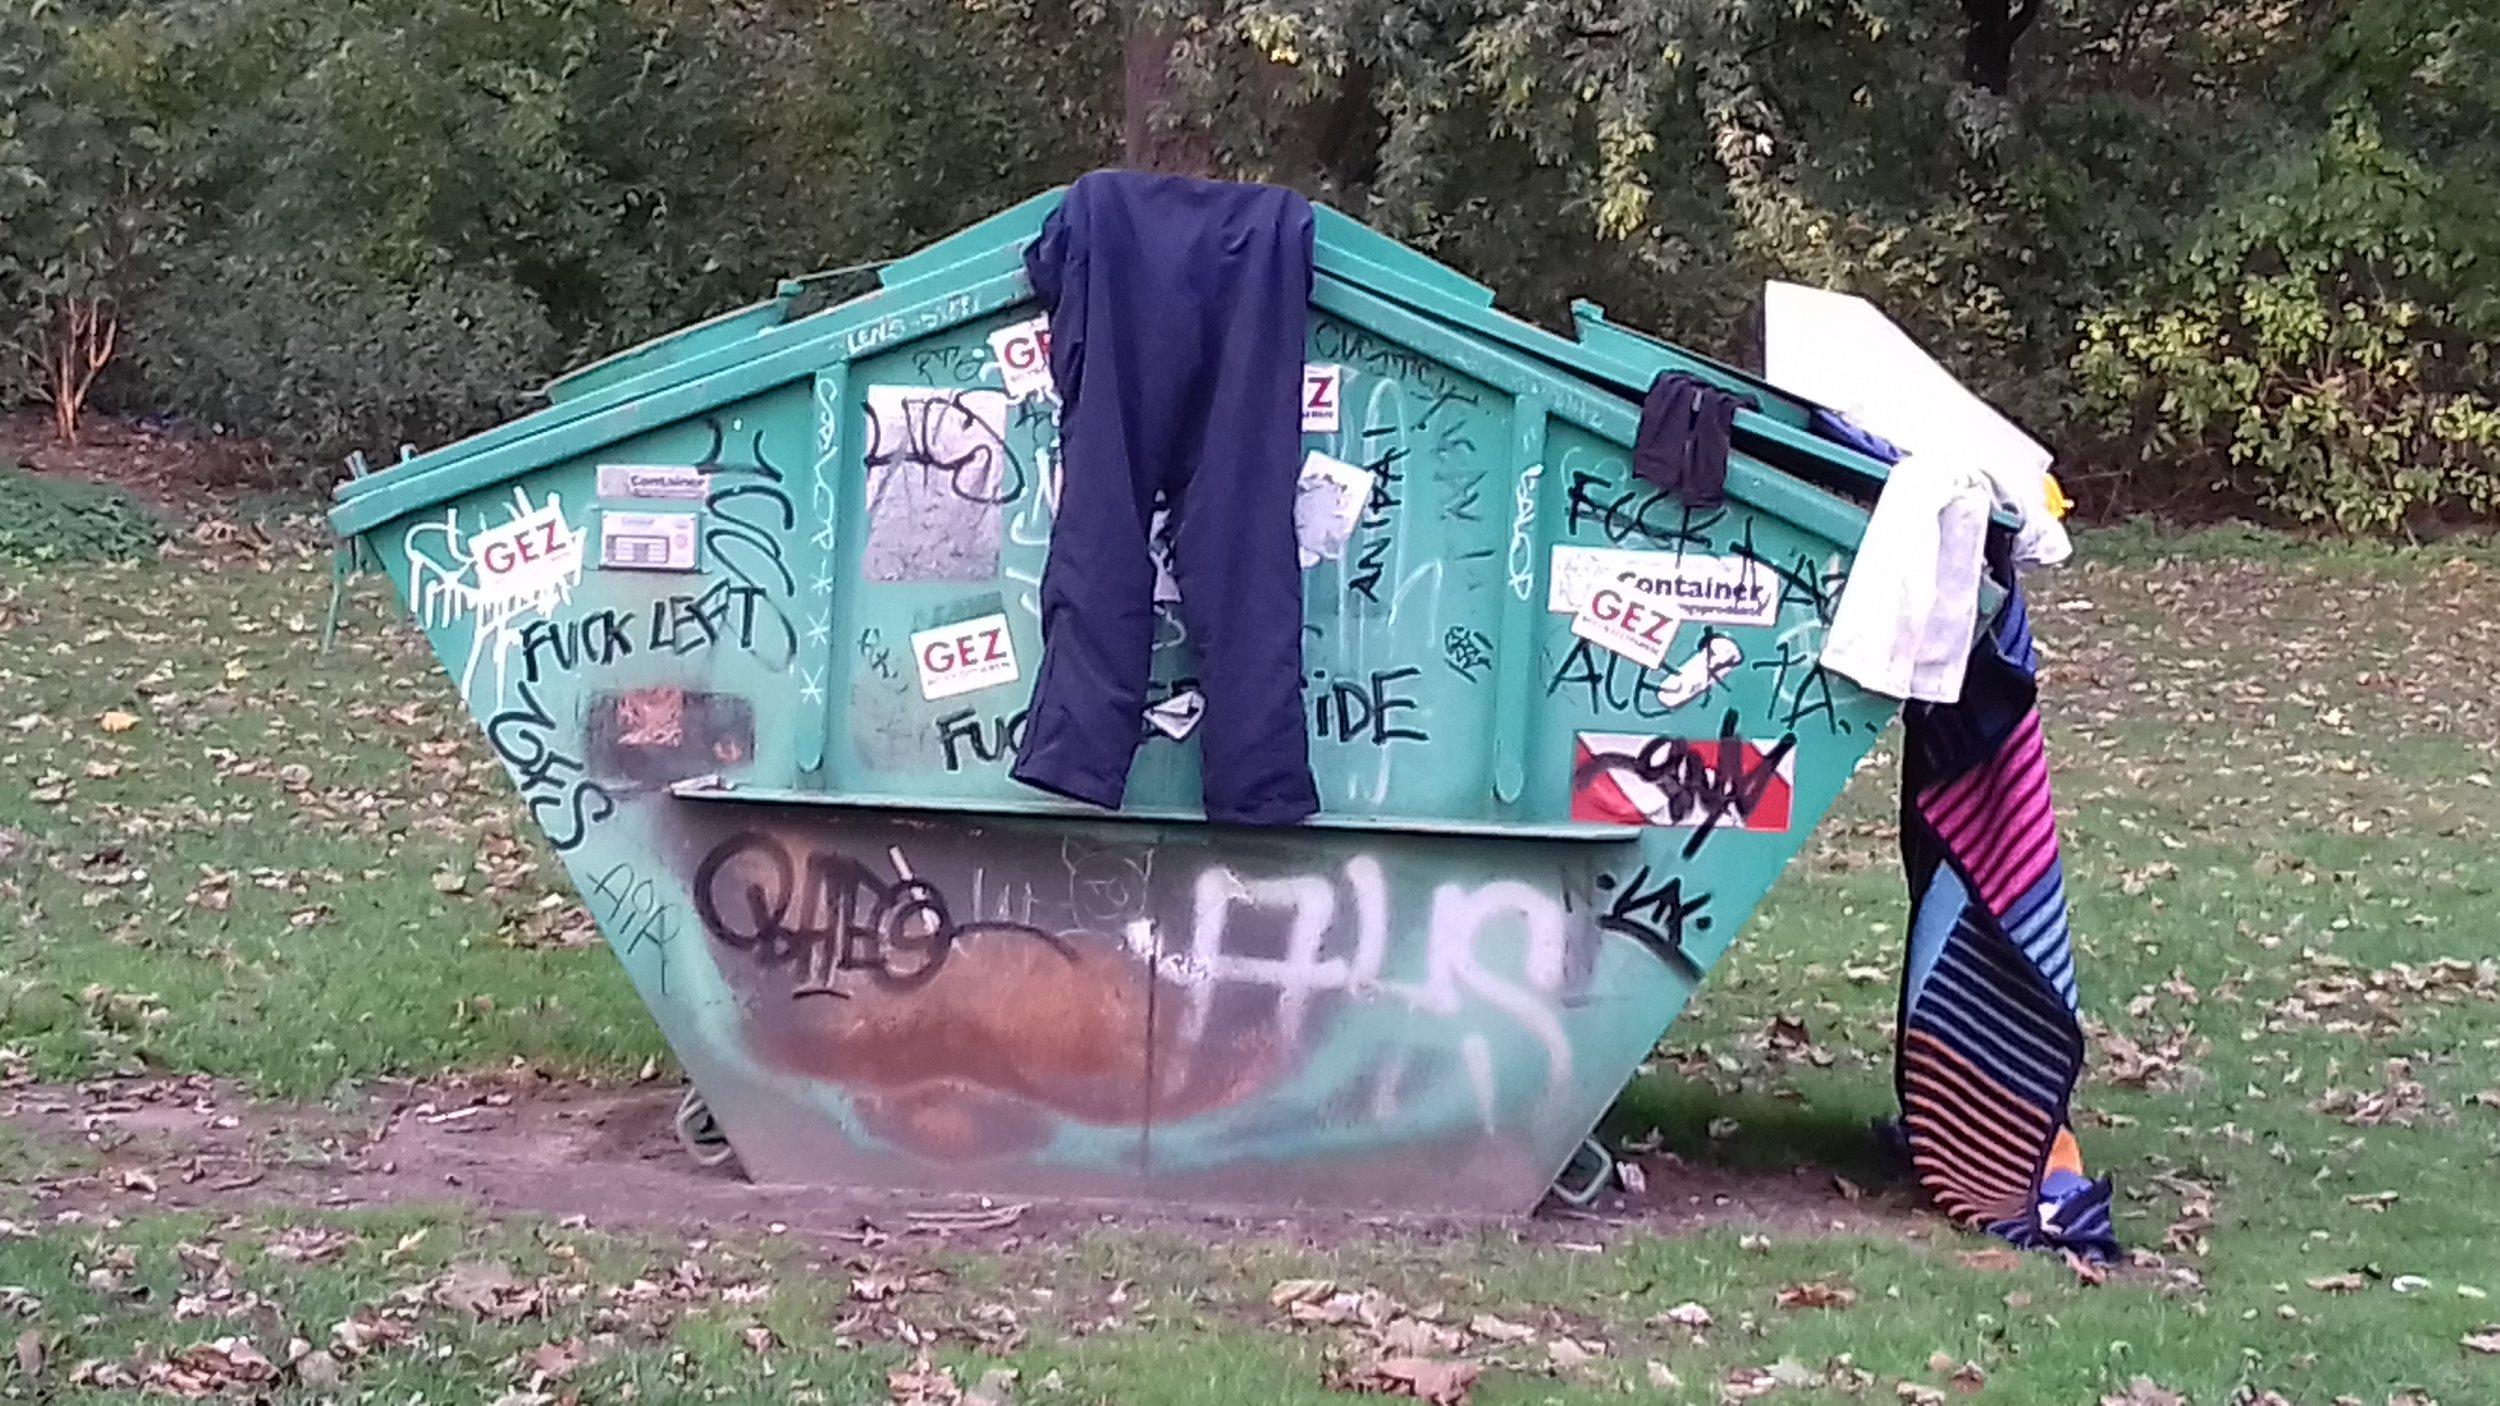 inspiration: trash or resources?